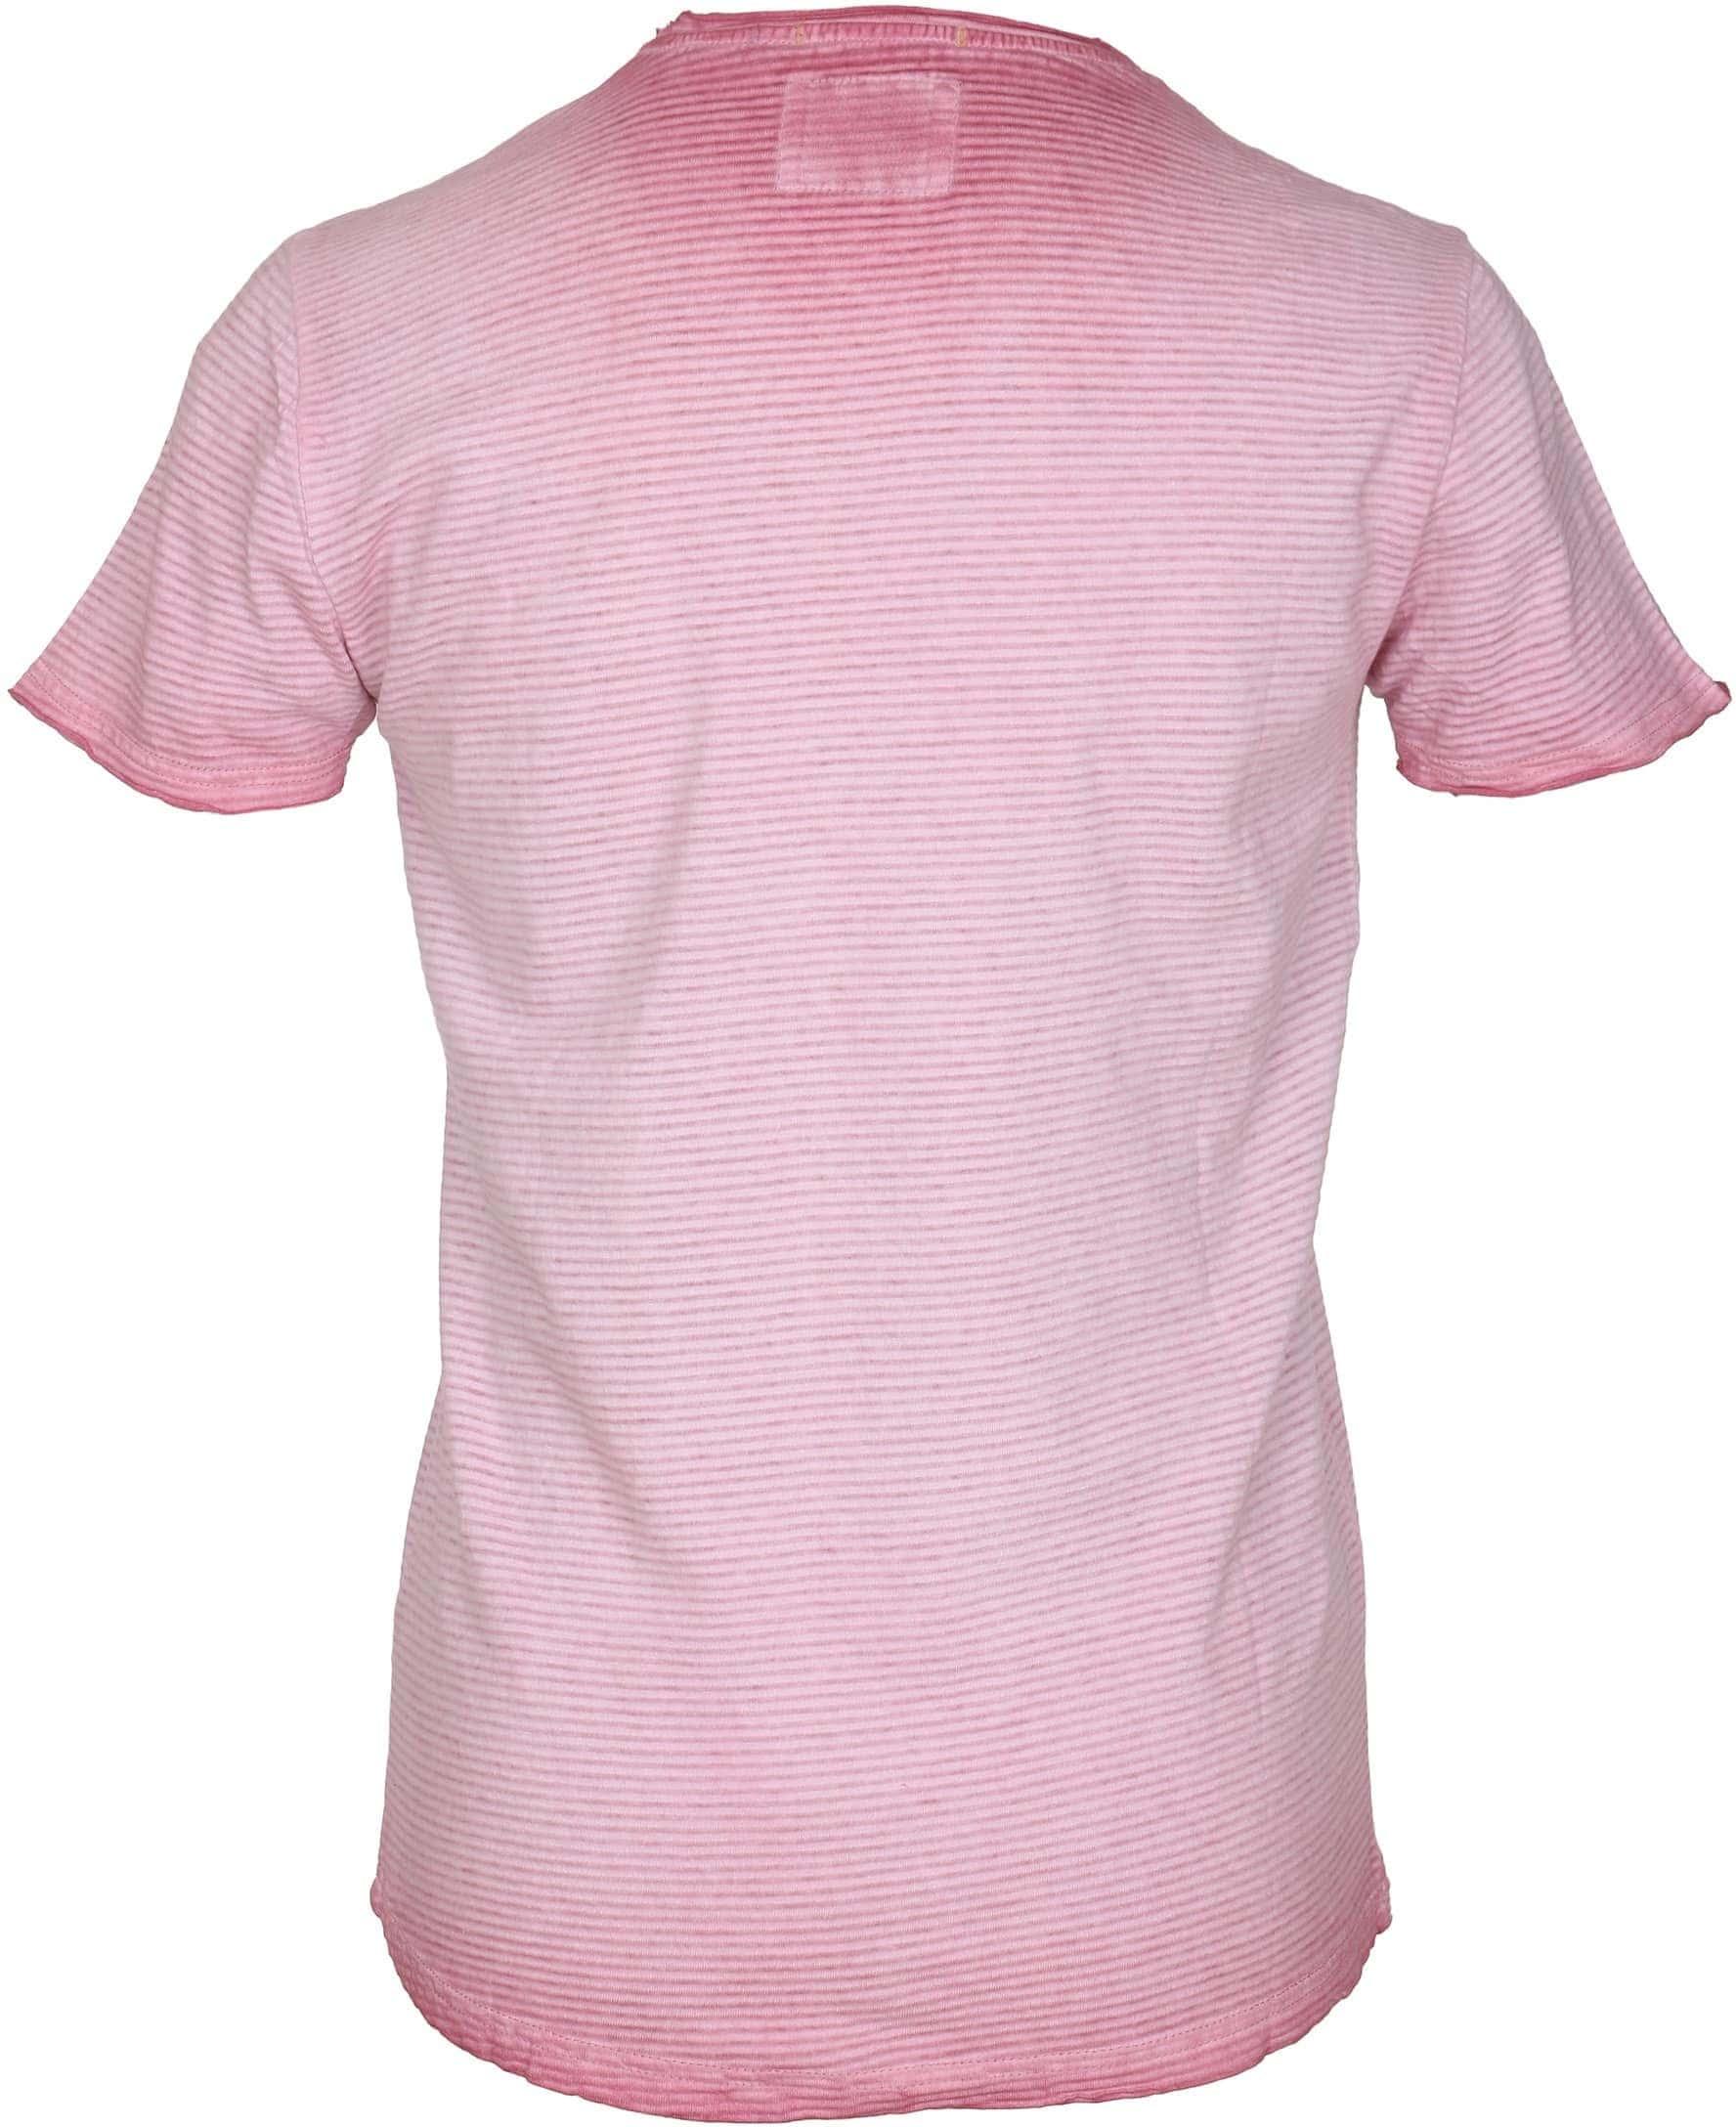 No-Excess T-shirt Roze Streep foto 2